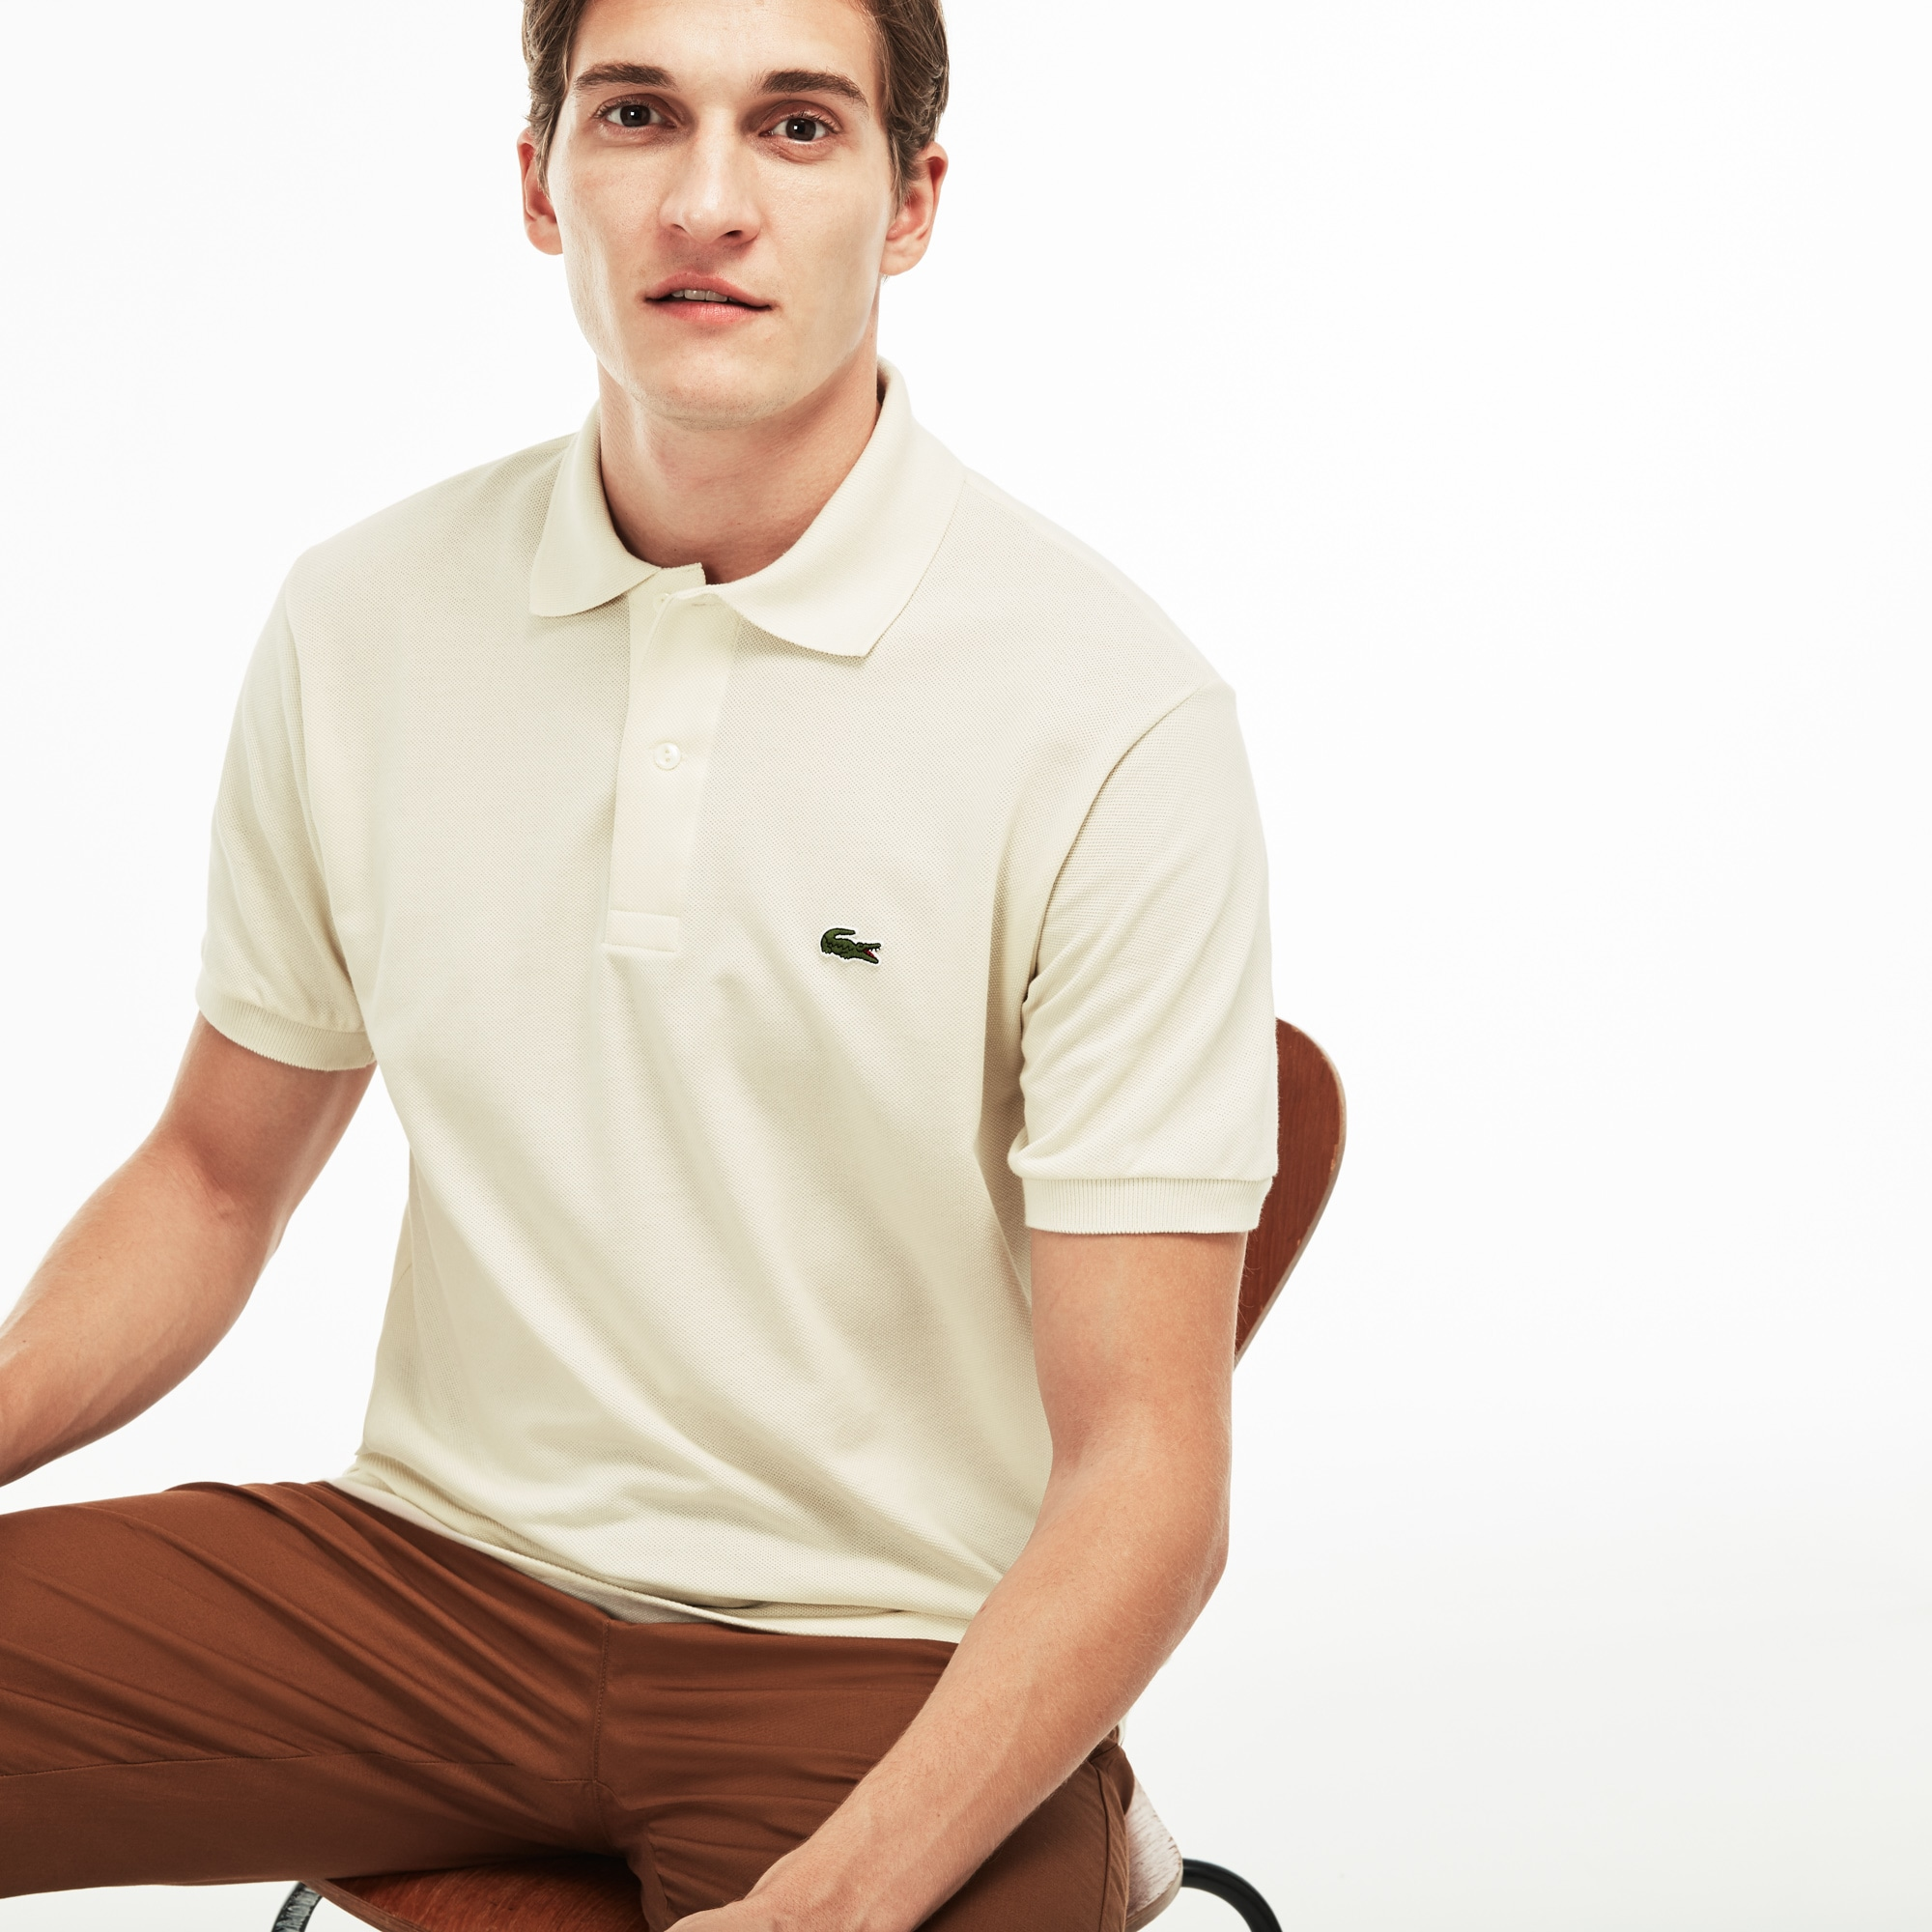 0d5afd8ba1 Camisas polo para homens